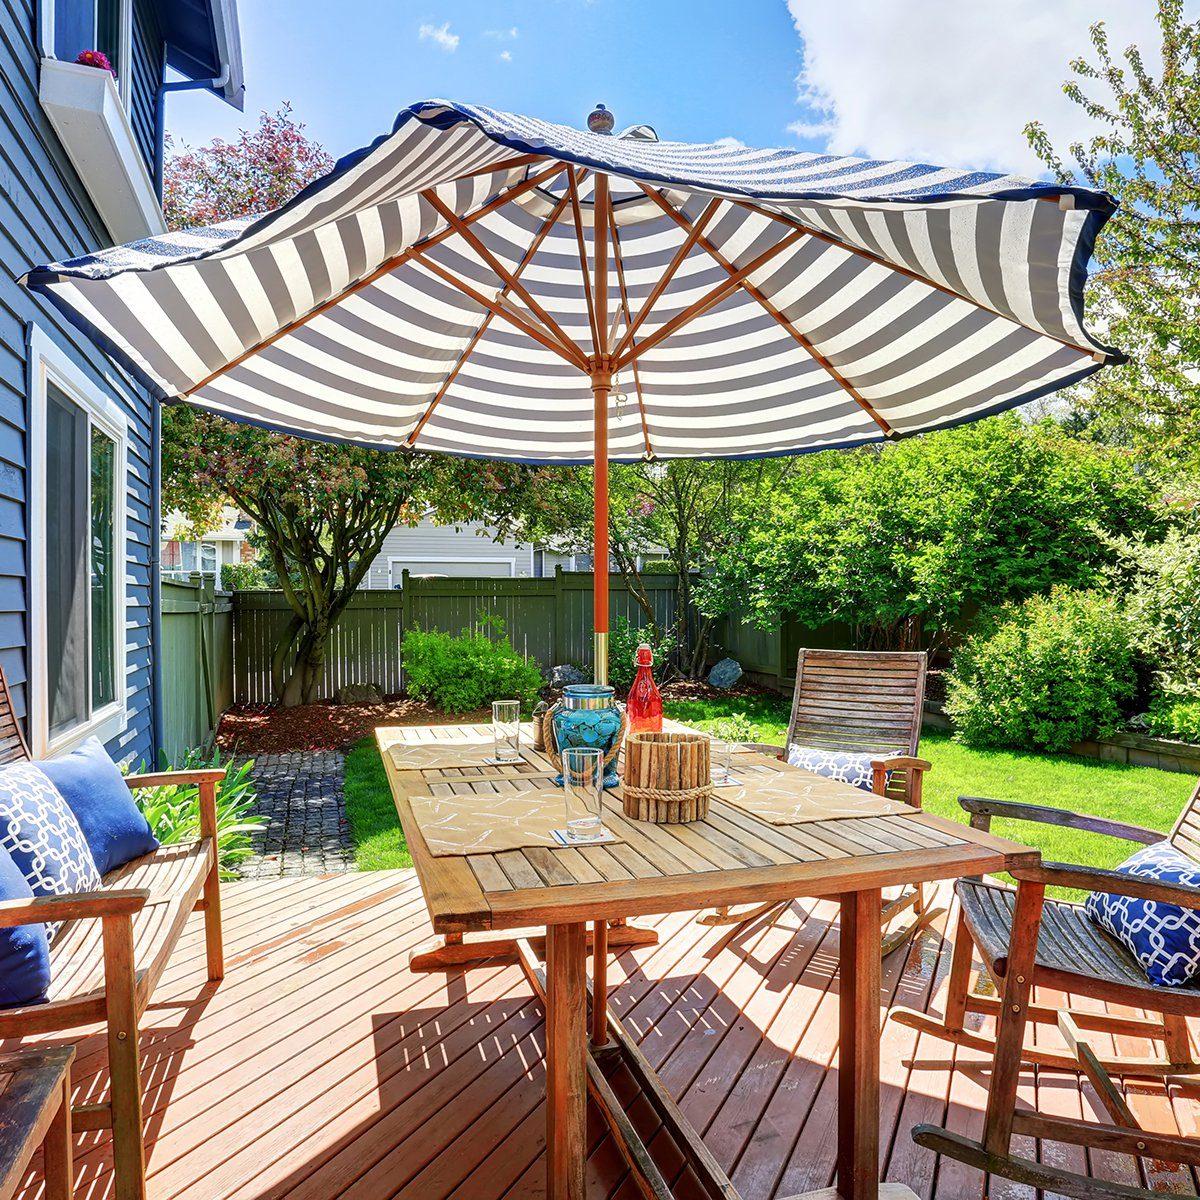 Wooden walkout deck in the backyard garden of blue siding house.